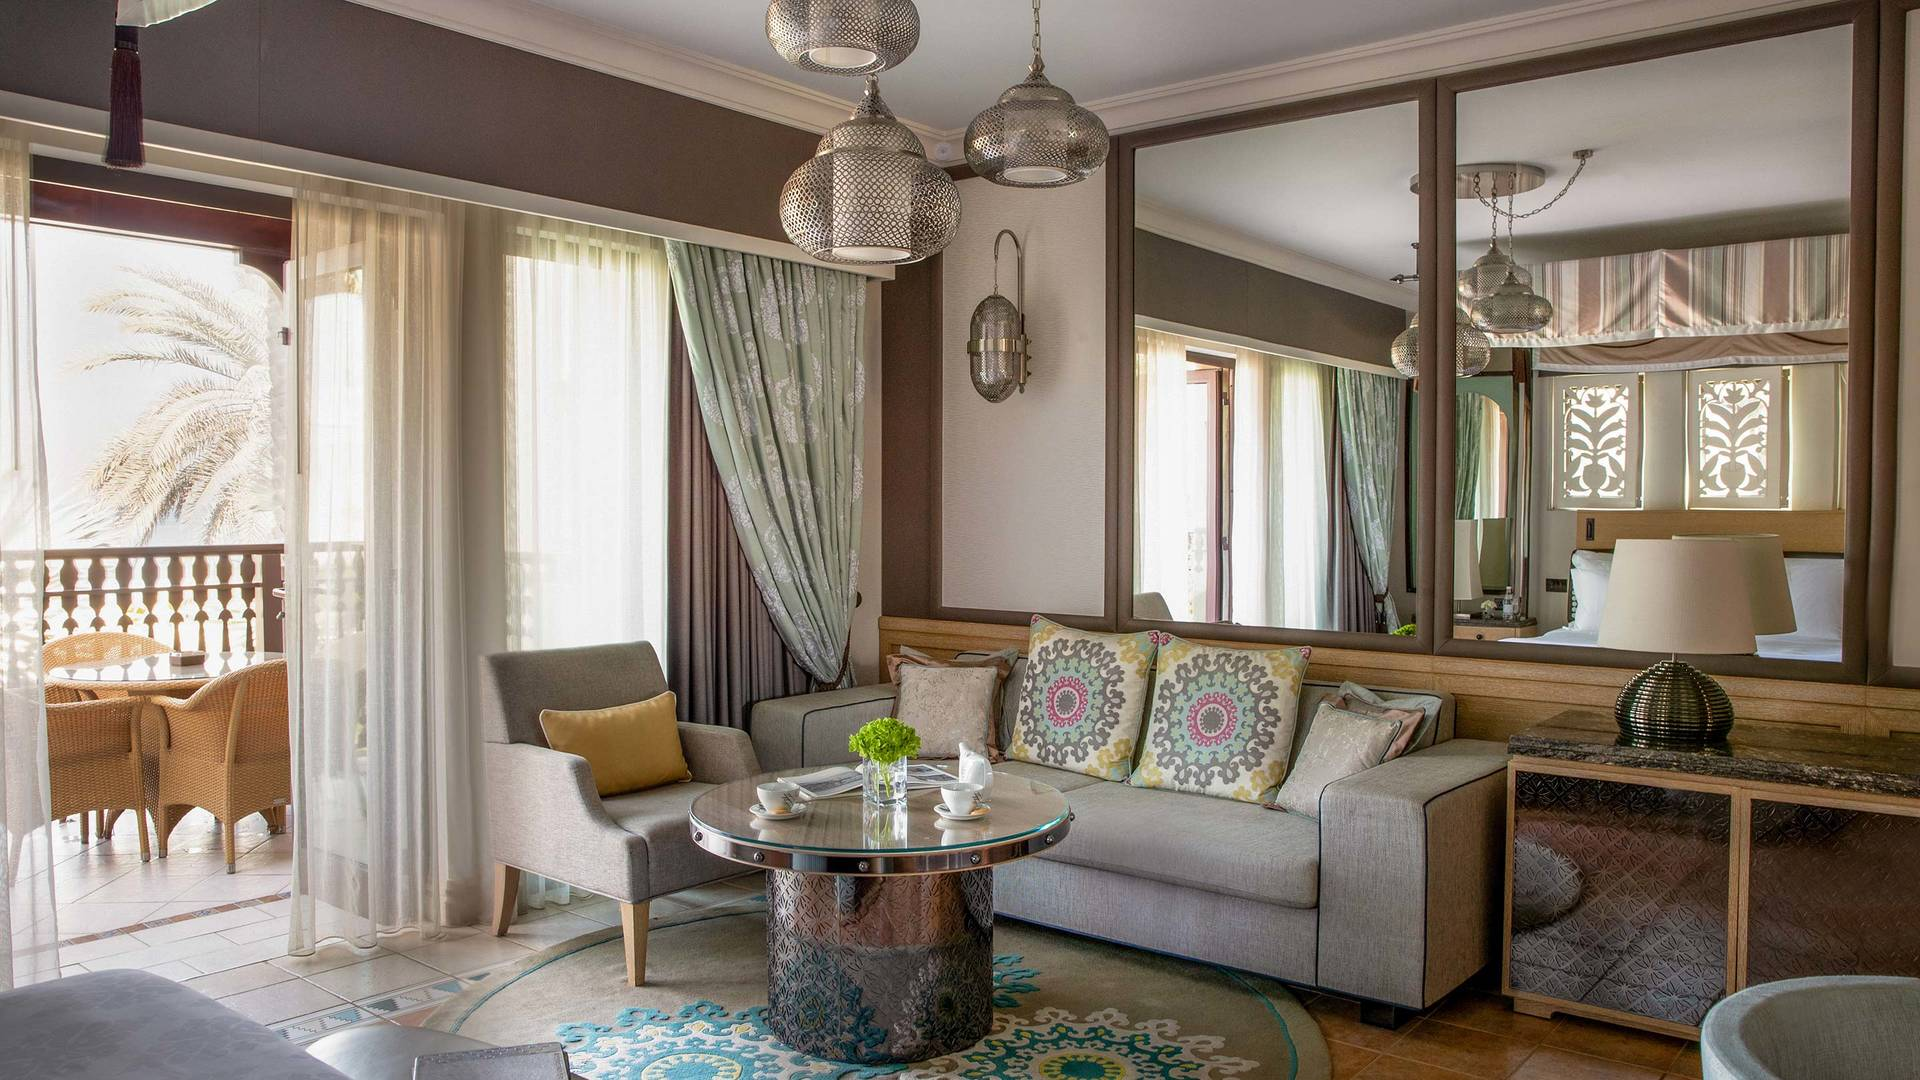 Jumeirah Dar Al Masyaf gulf summerhouse arabian deluxe living area_16-9